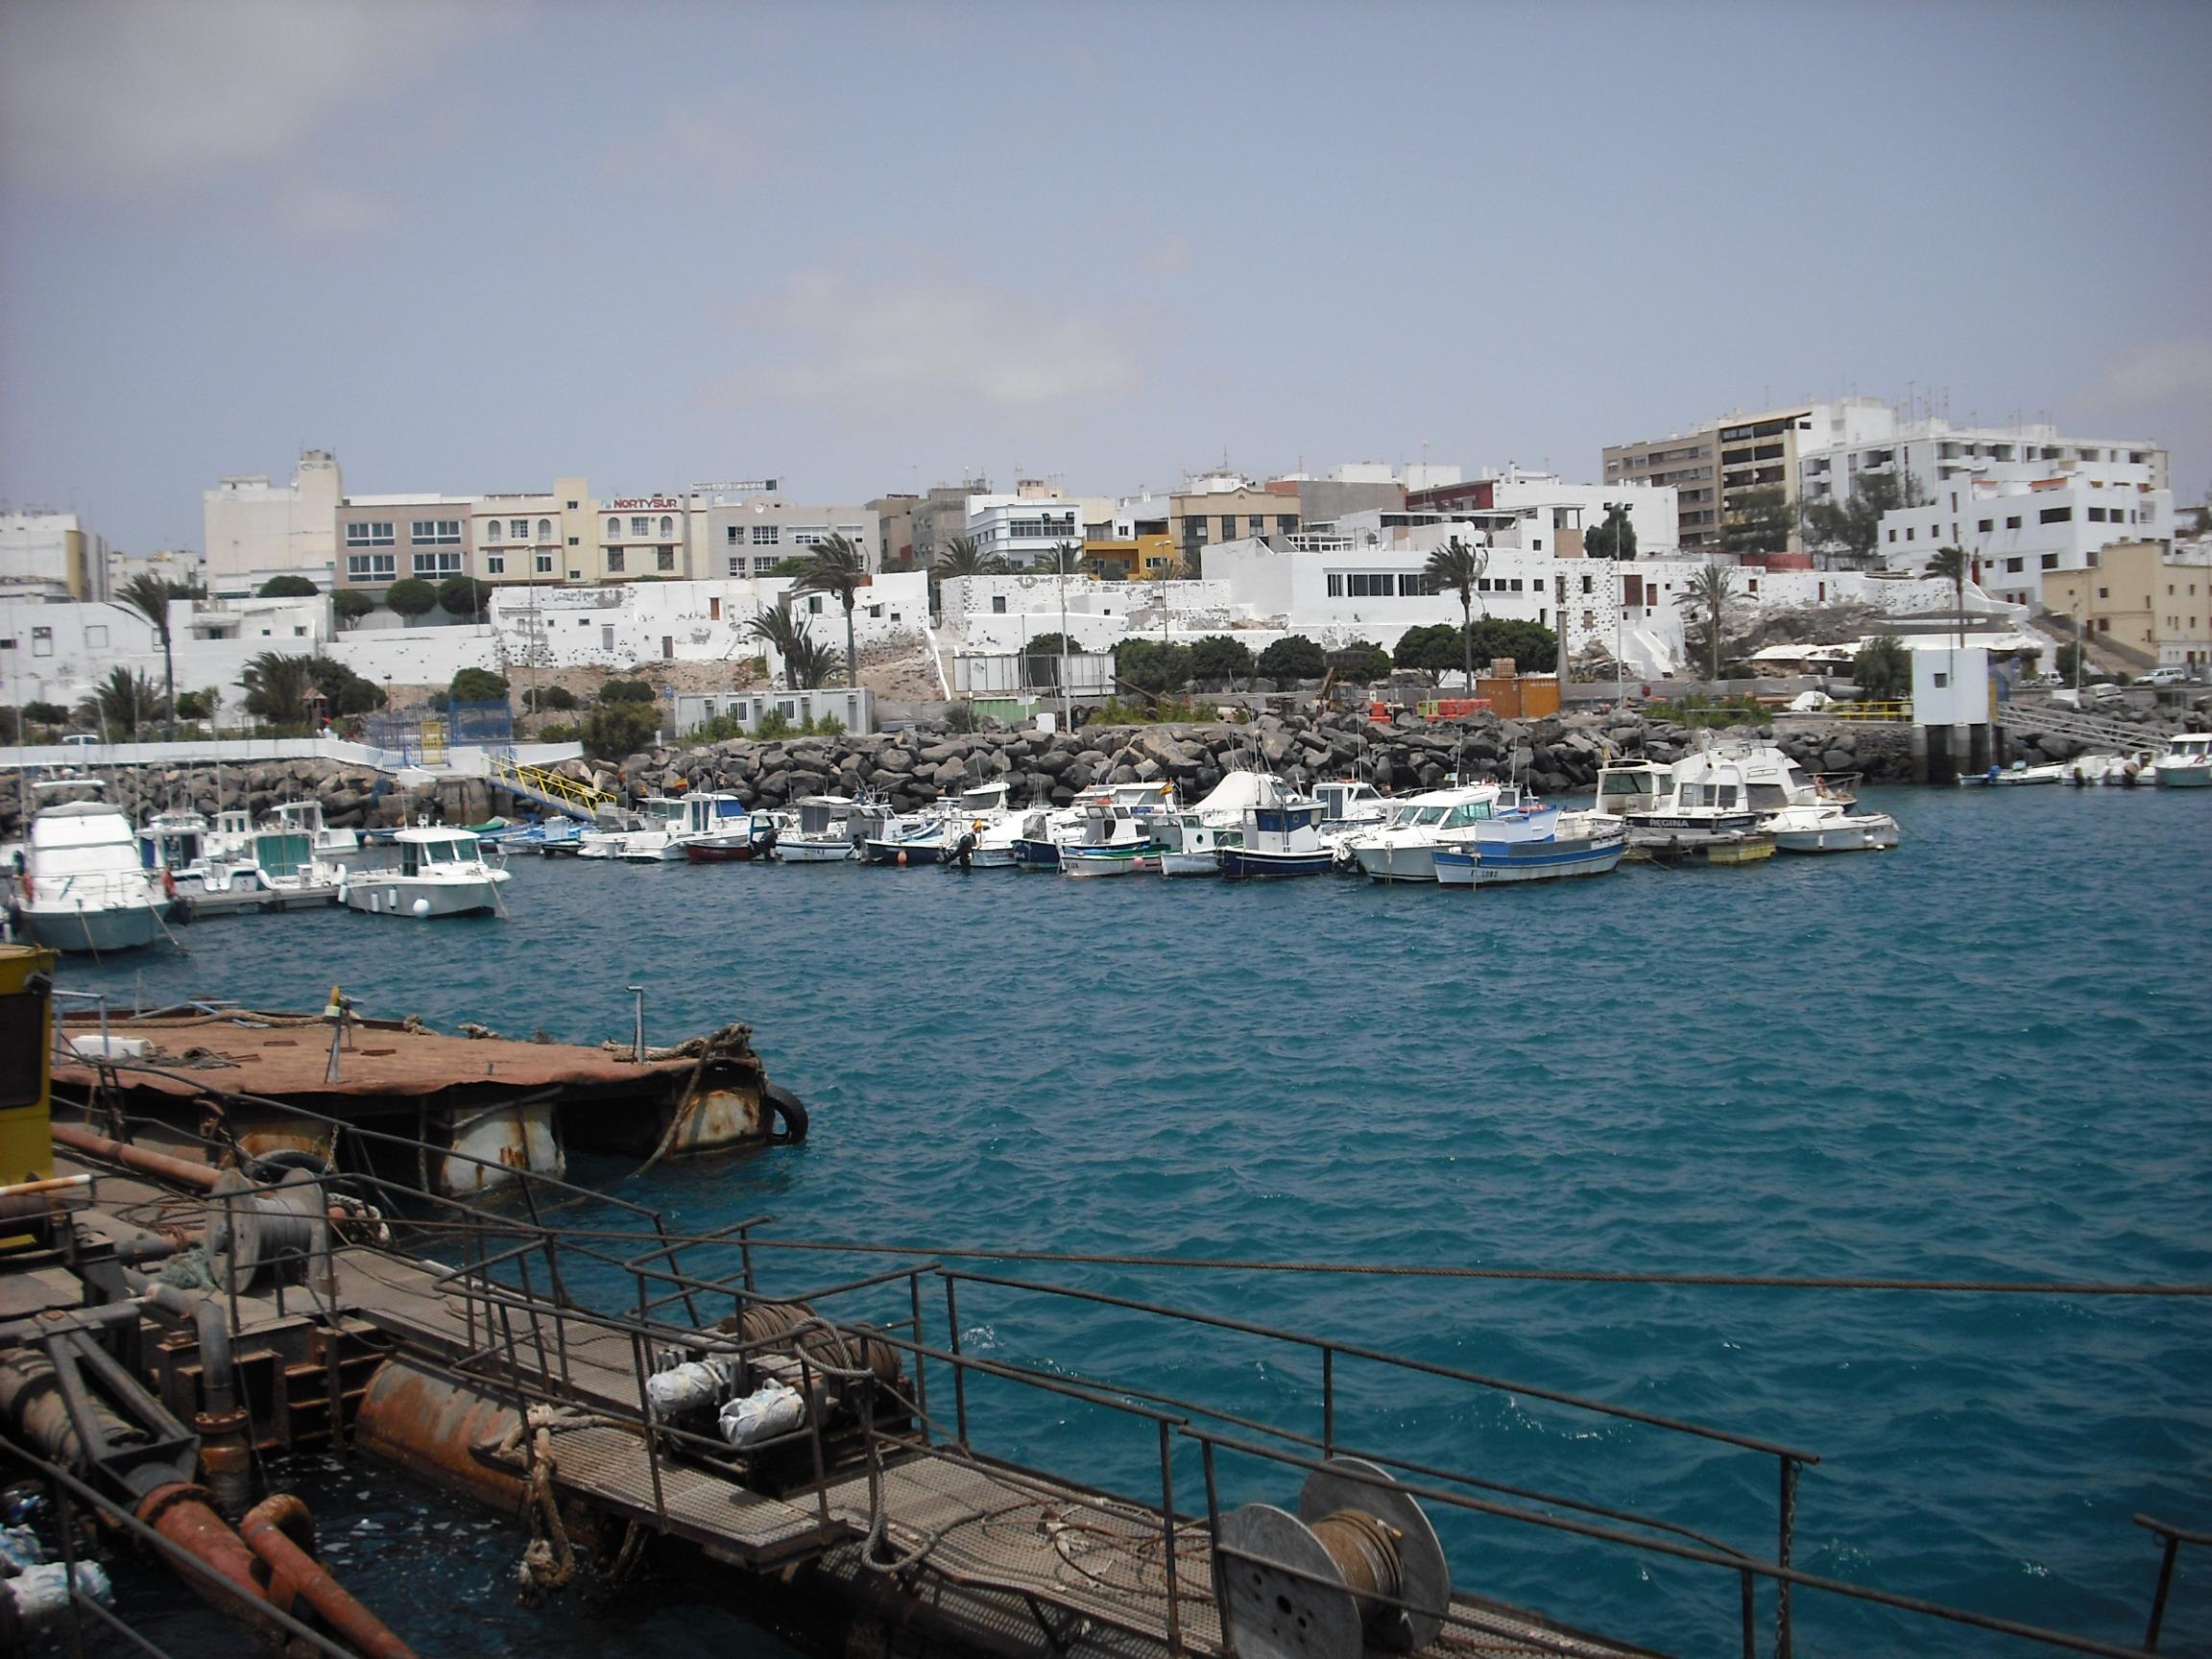 Noleggio Barche Port del Rosario – Isola di Fuerteventura - Navalia | Noleggia un Sogno